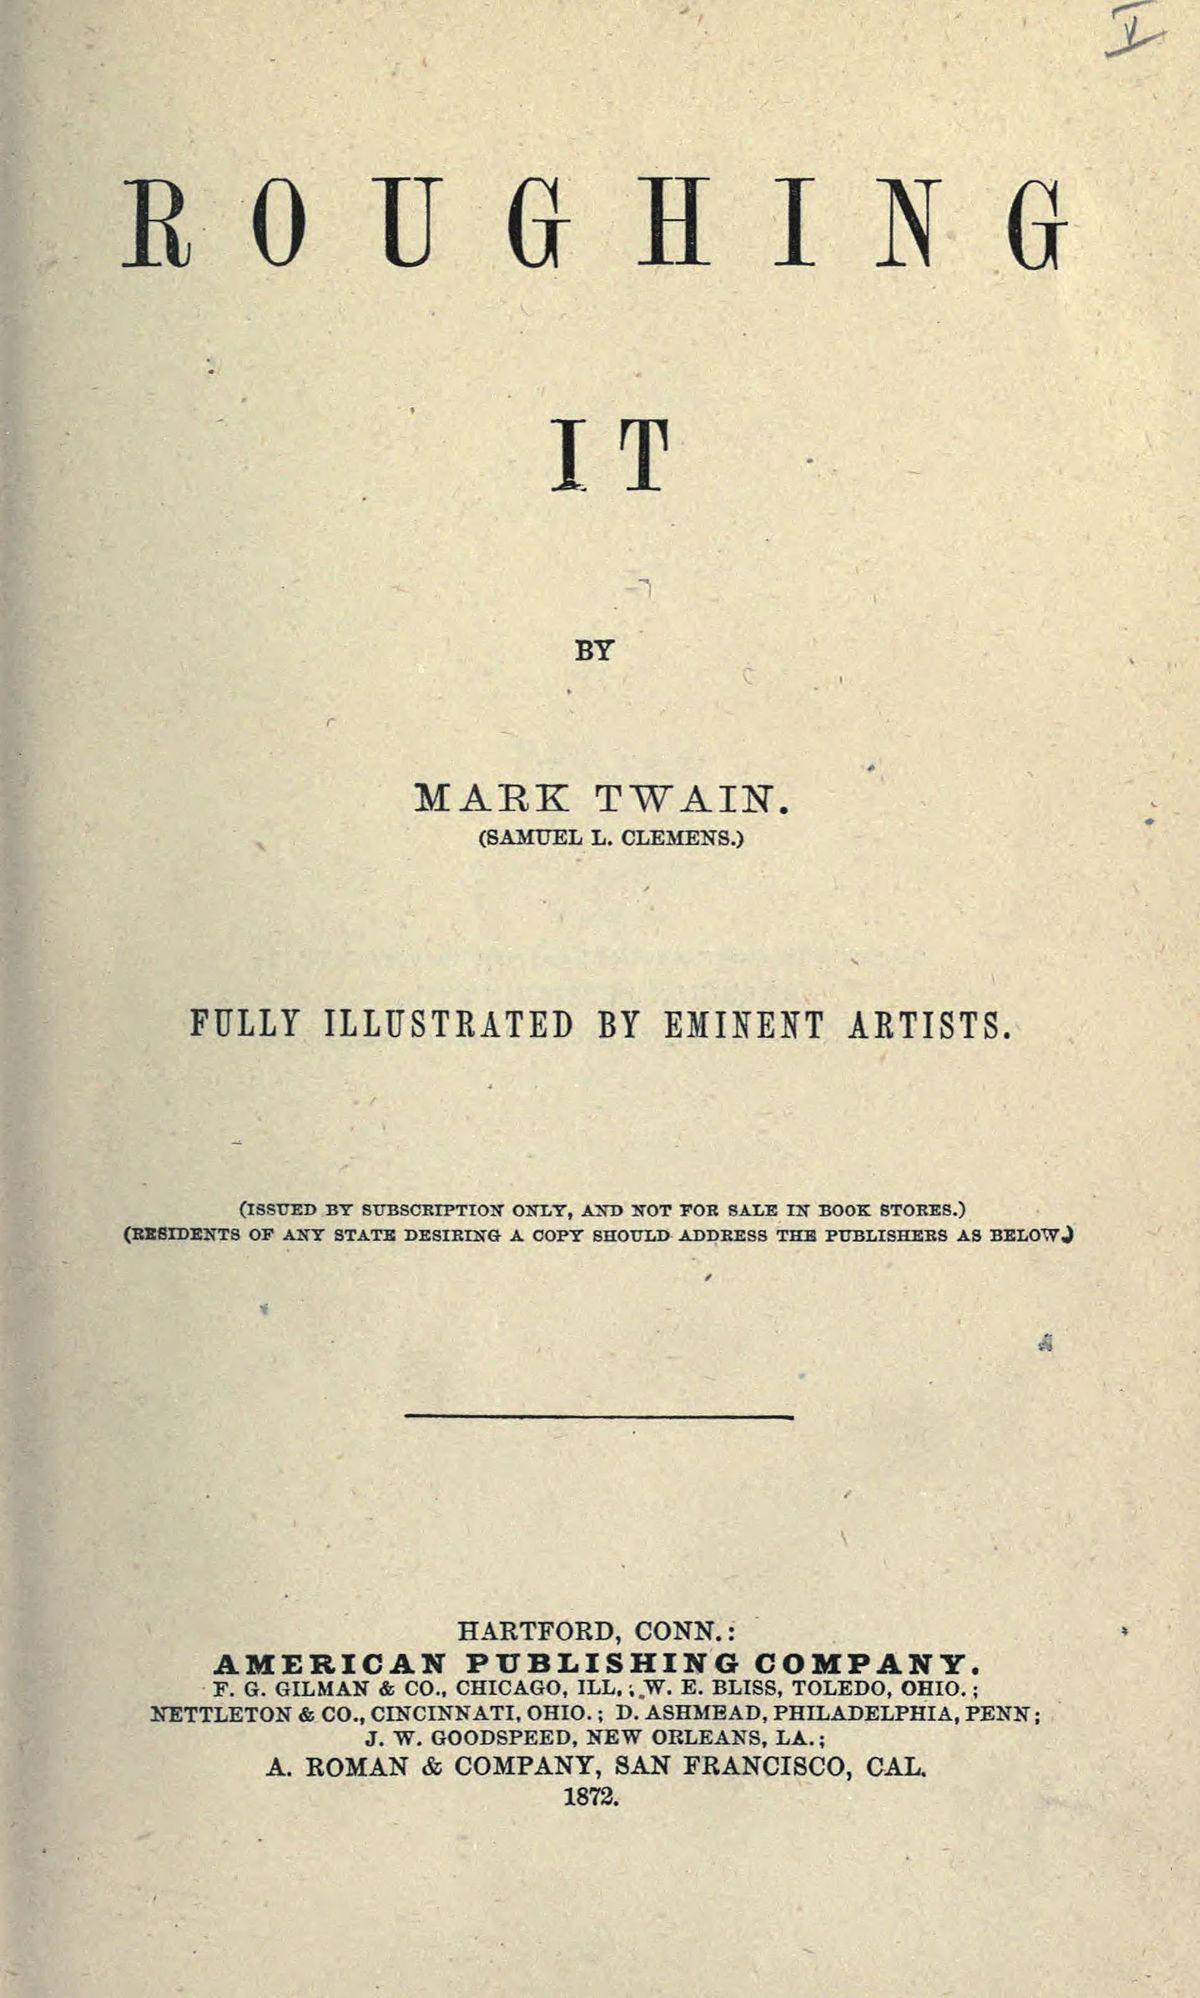 Mark Twain's Top 10 Writing Tips